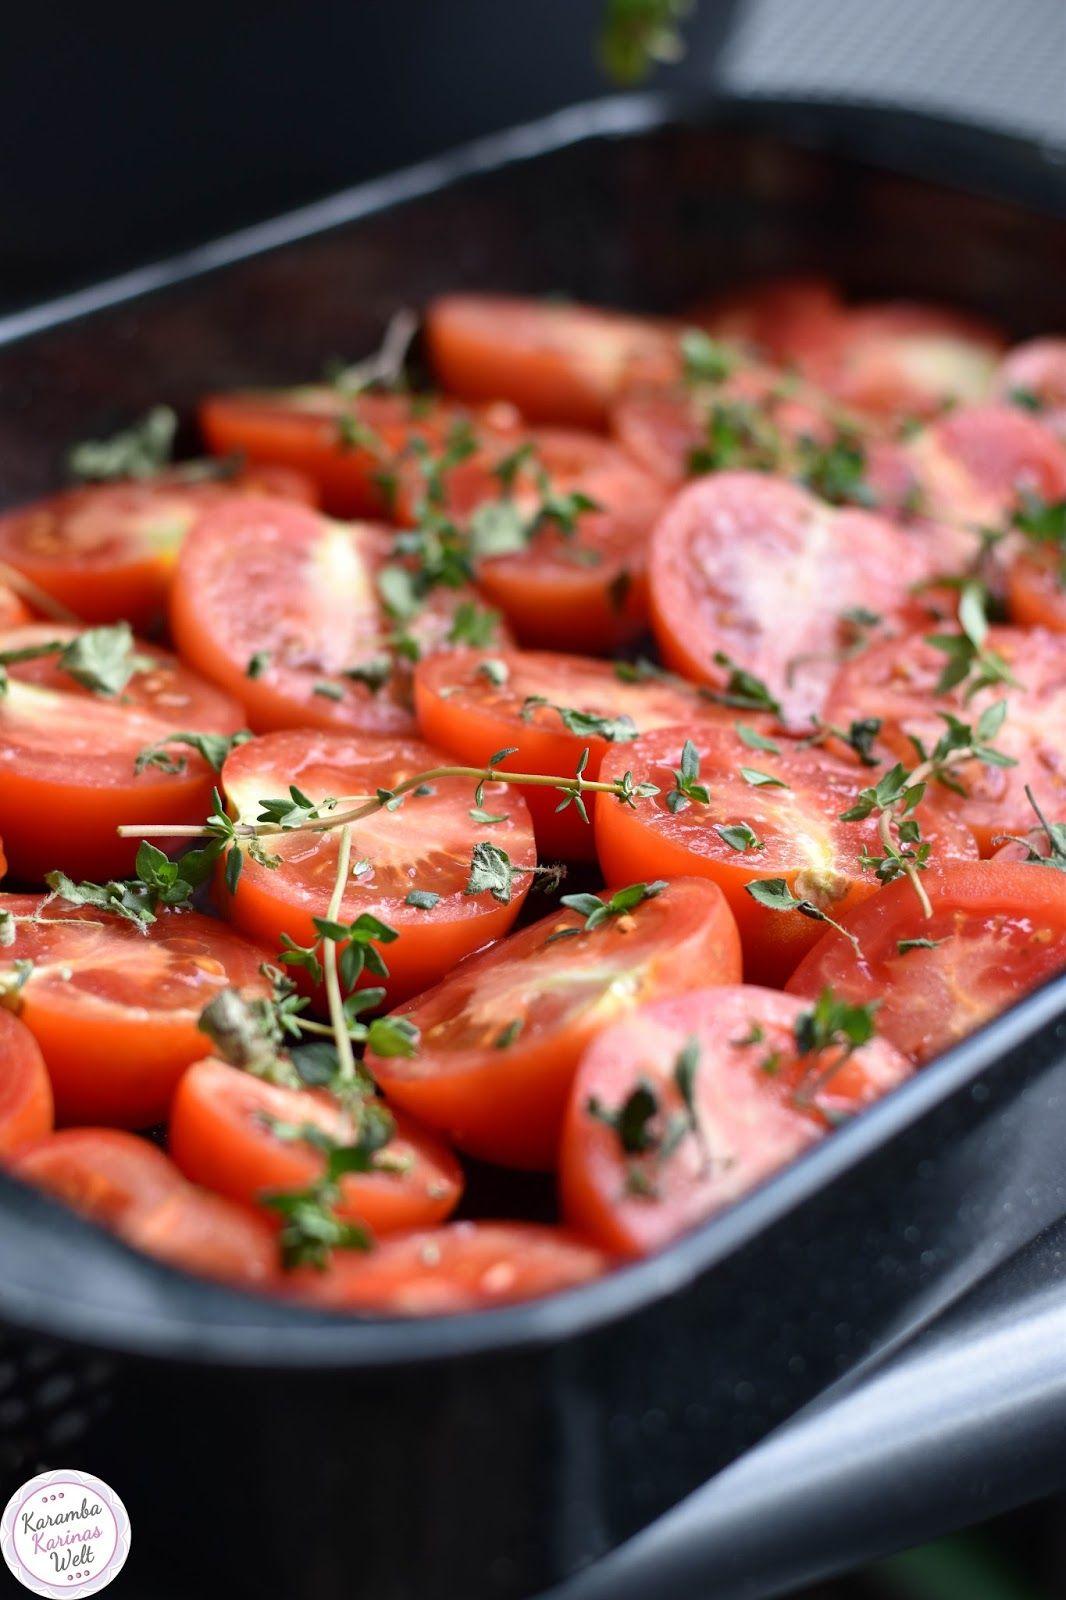 Tomatensosse Aus Dem Backofen Rezepte Tomatenrezepte Tomaten Einkochen